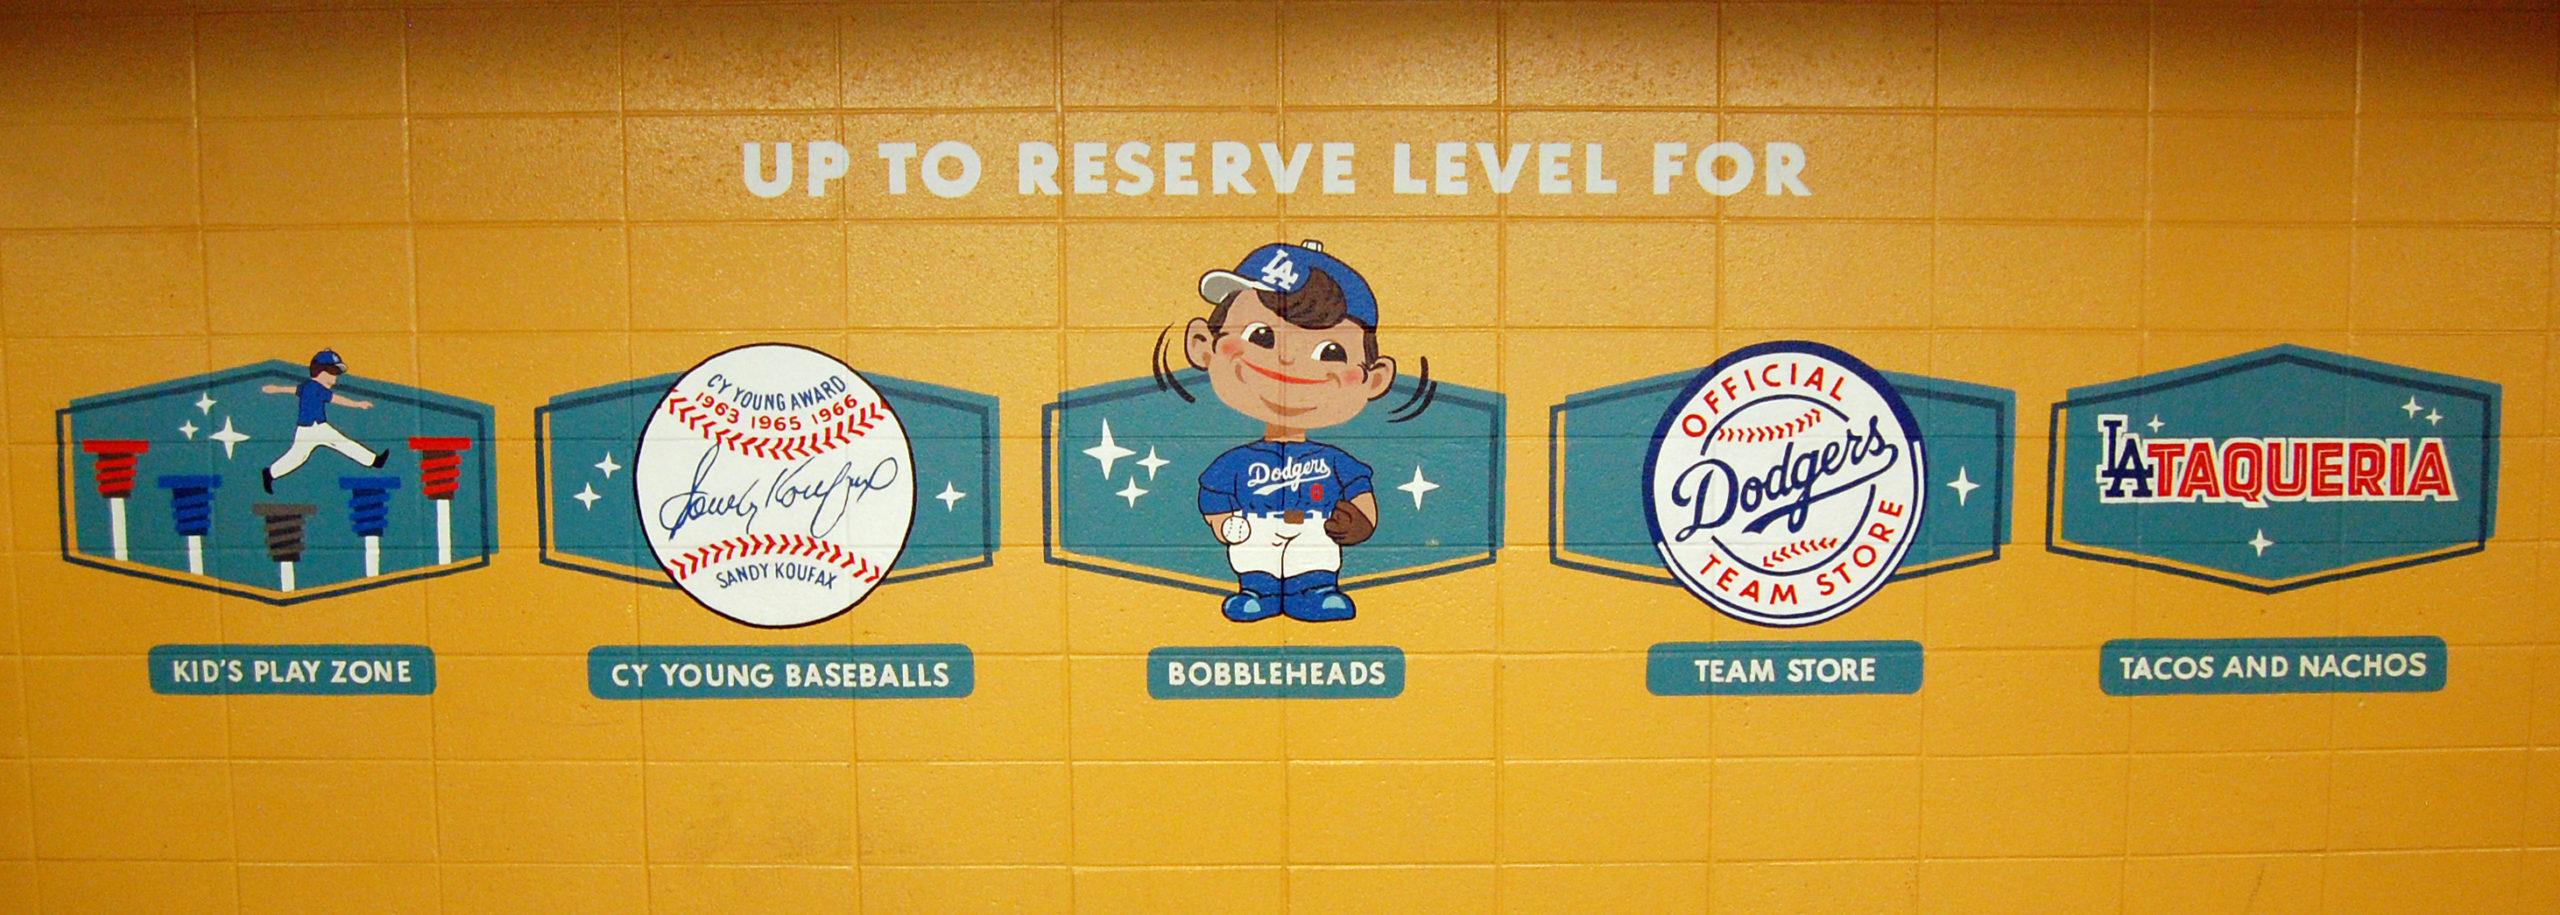 Retro wayfinding signage at Dodger Stadium